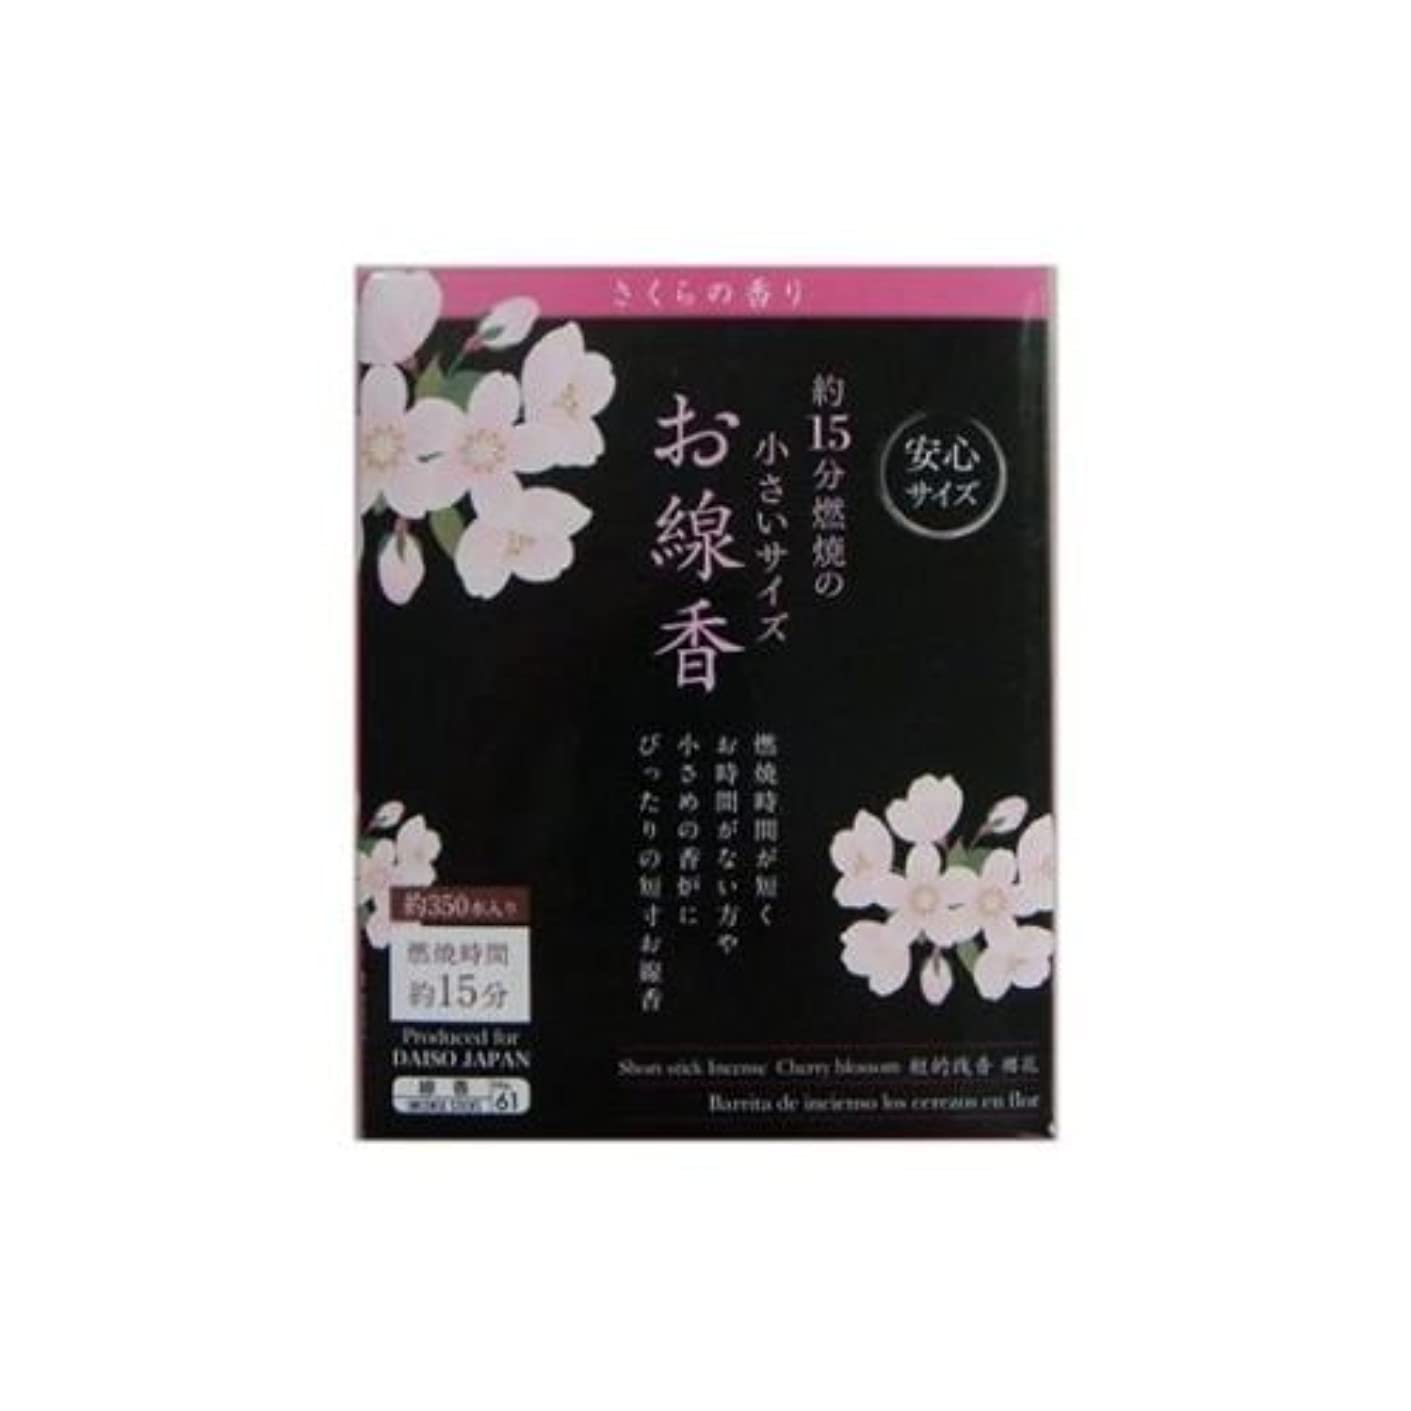 Daiso Senko Japanese Incense桜ショートスティック9 cm-15min / 350 sticks